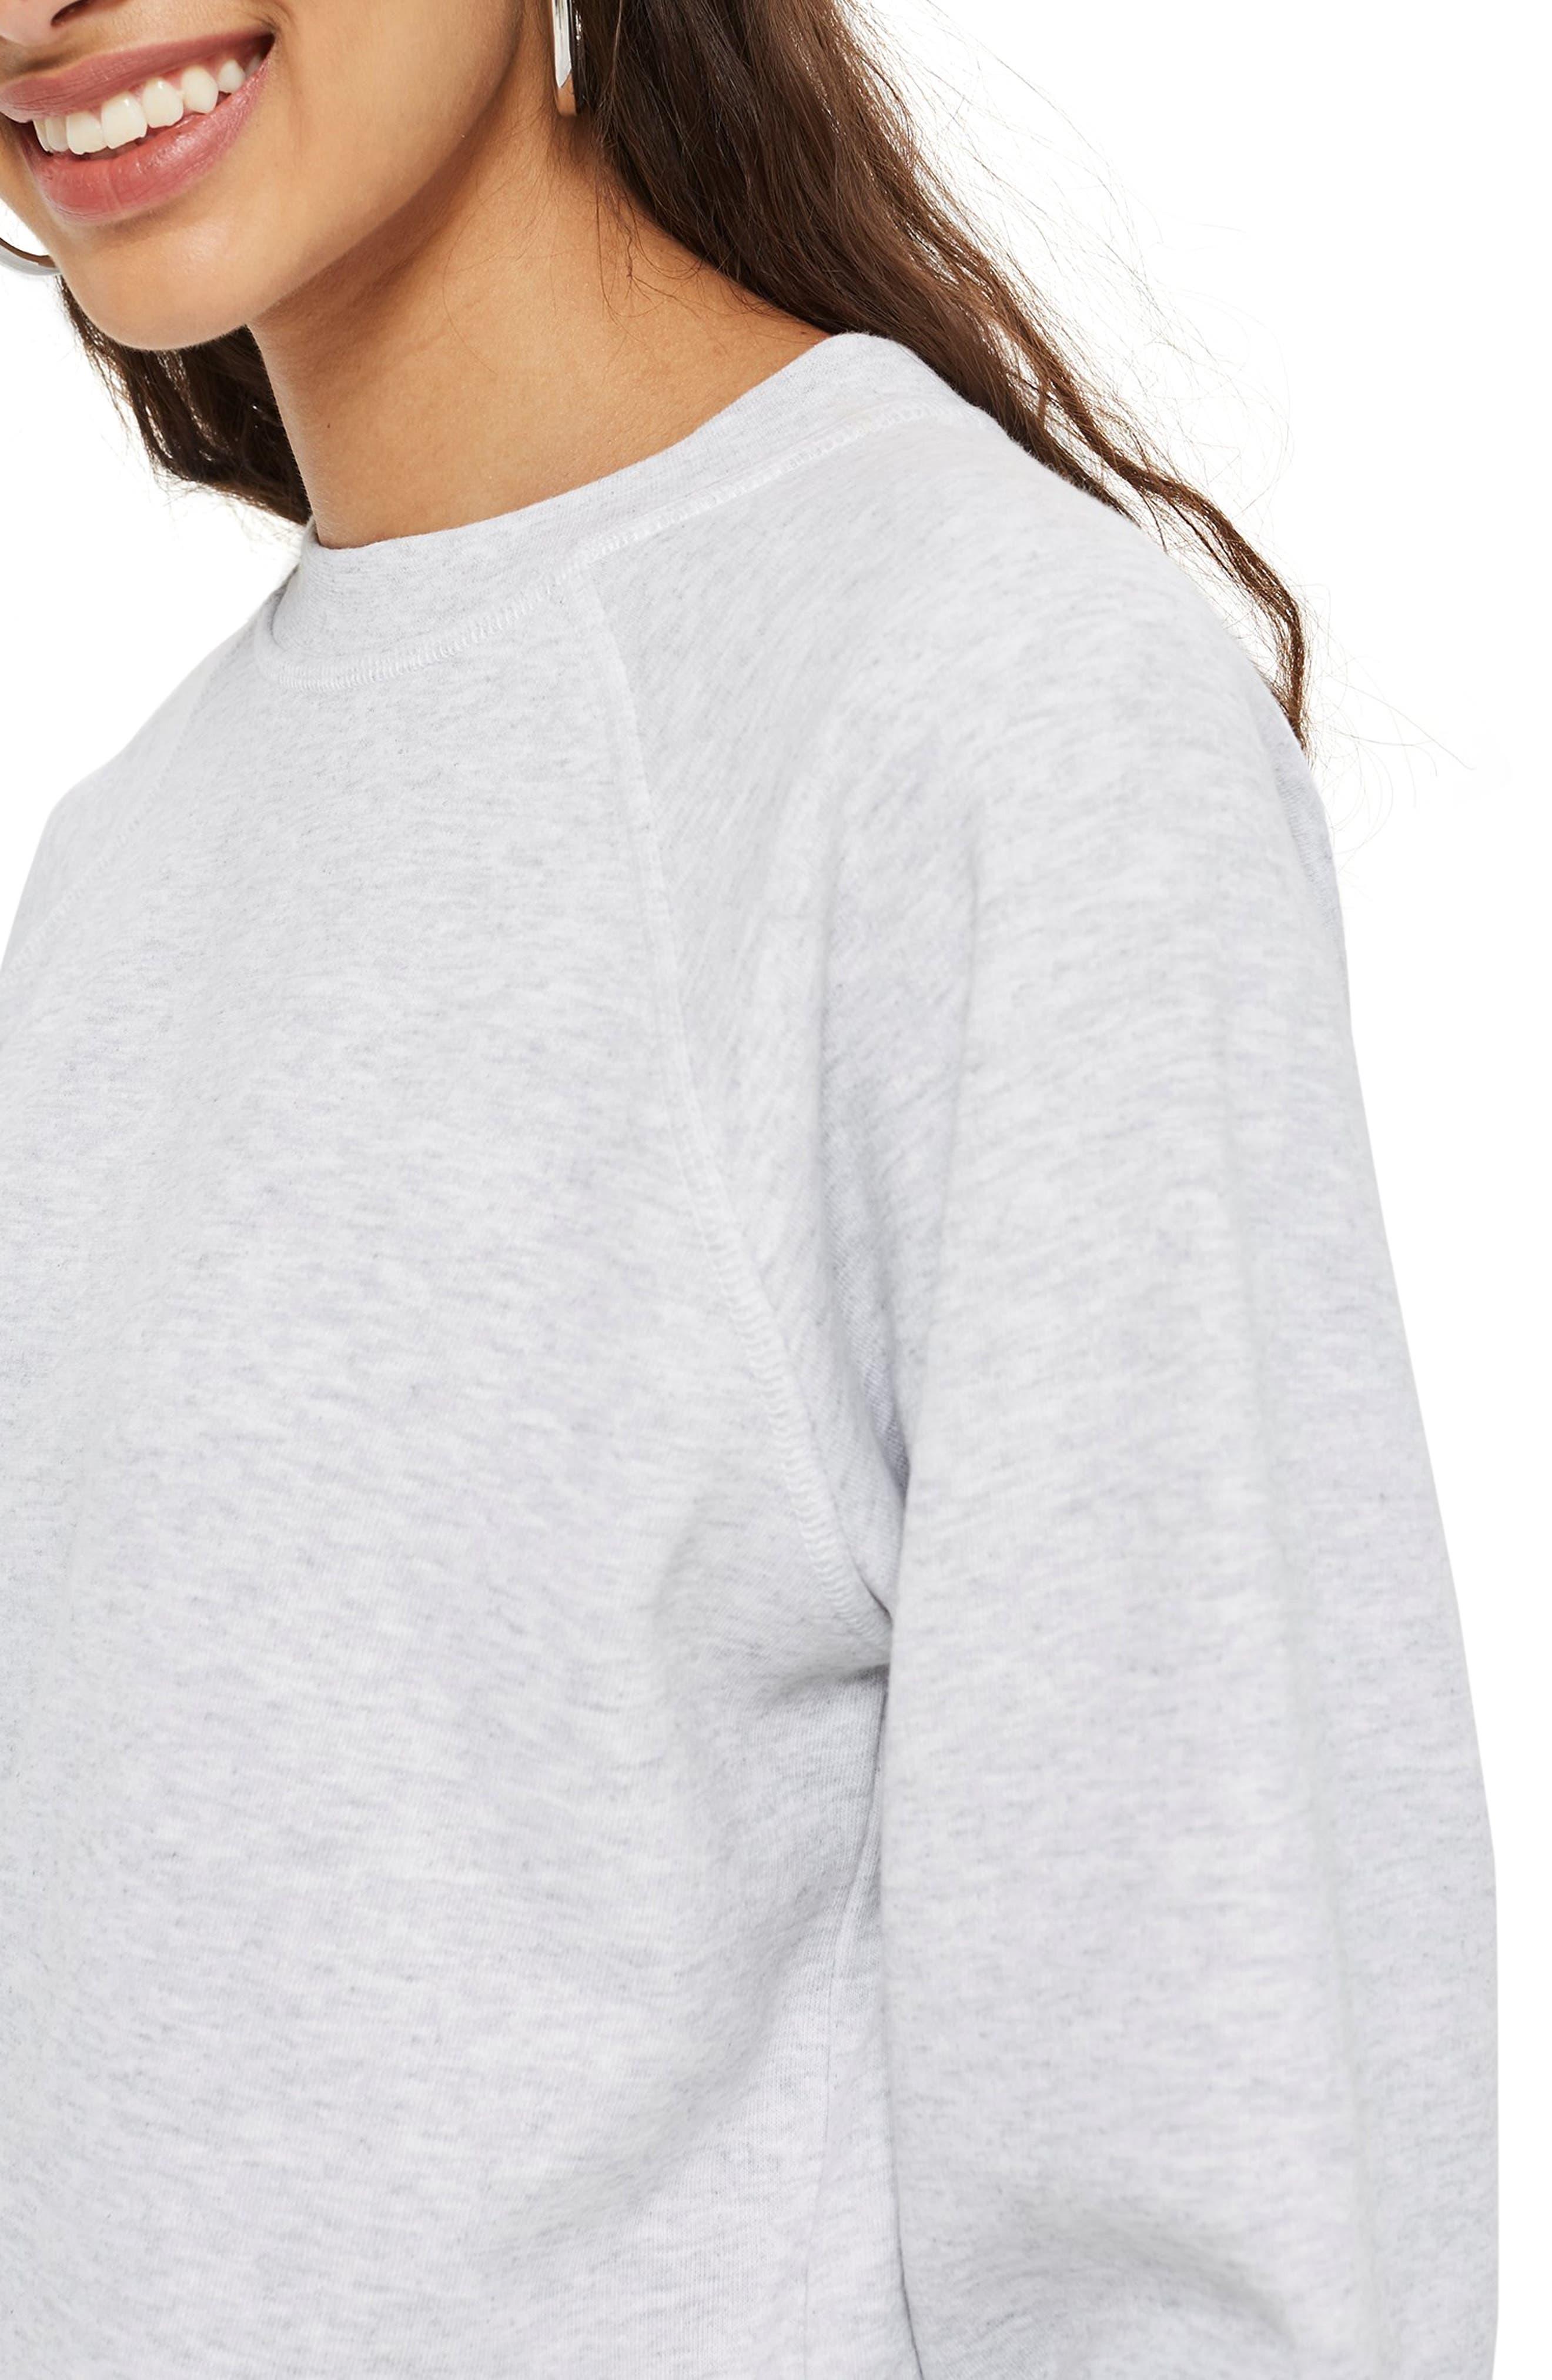 TOPSHOP, Crewneck Sweatshirt, Alternate thumbnail 3, color, 020